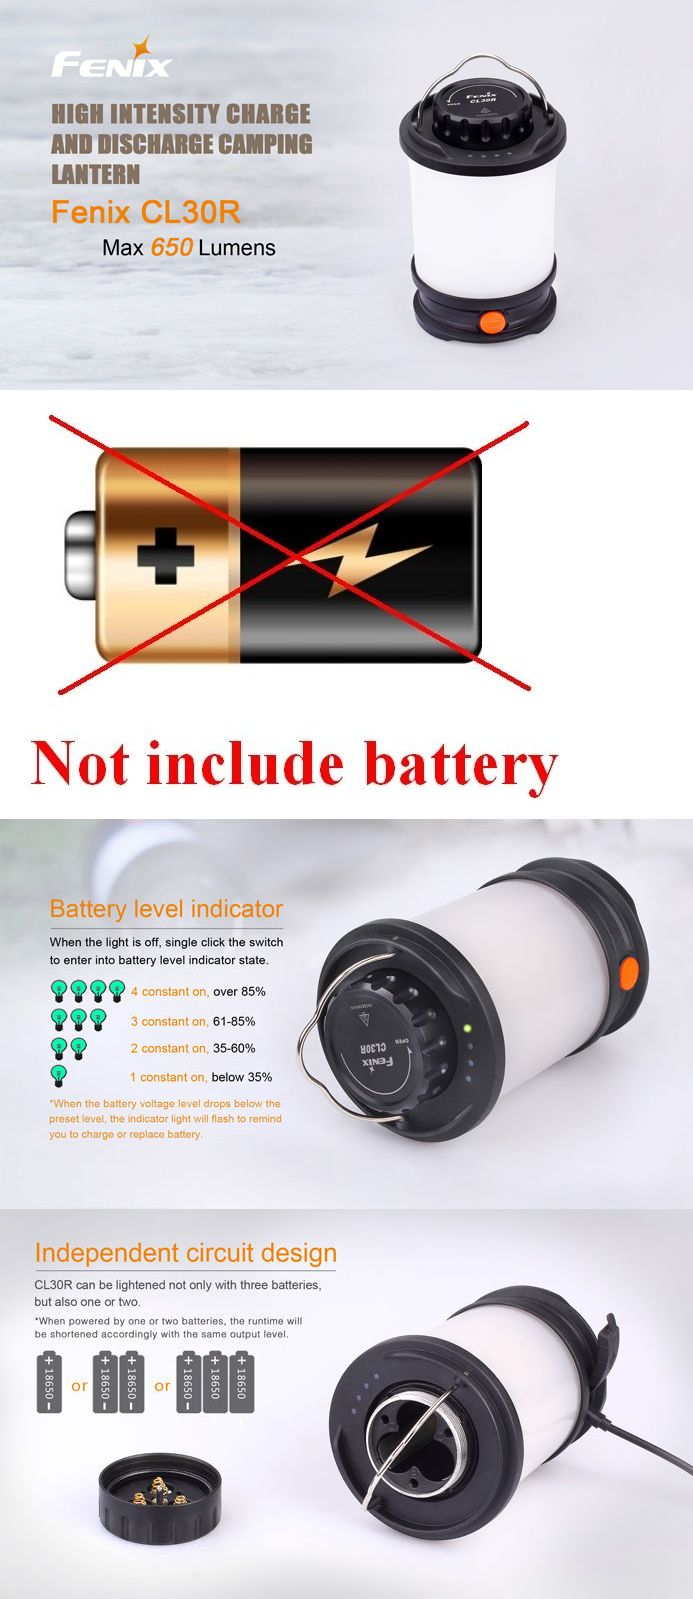 Lanterns 168867: New Fenix Cl30r 650 Lumens Led Camping Lantern Light Usb Power Bank (No Battery) -> BUY IT NOW ONLY: $89.99 on eBay!